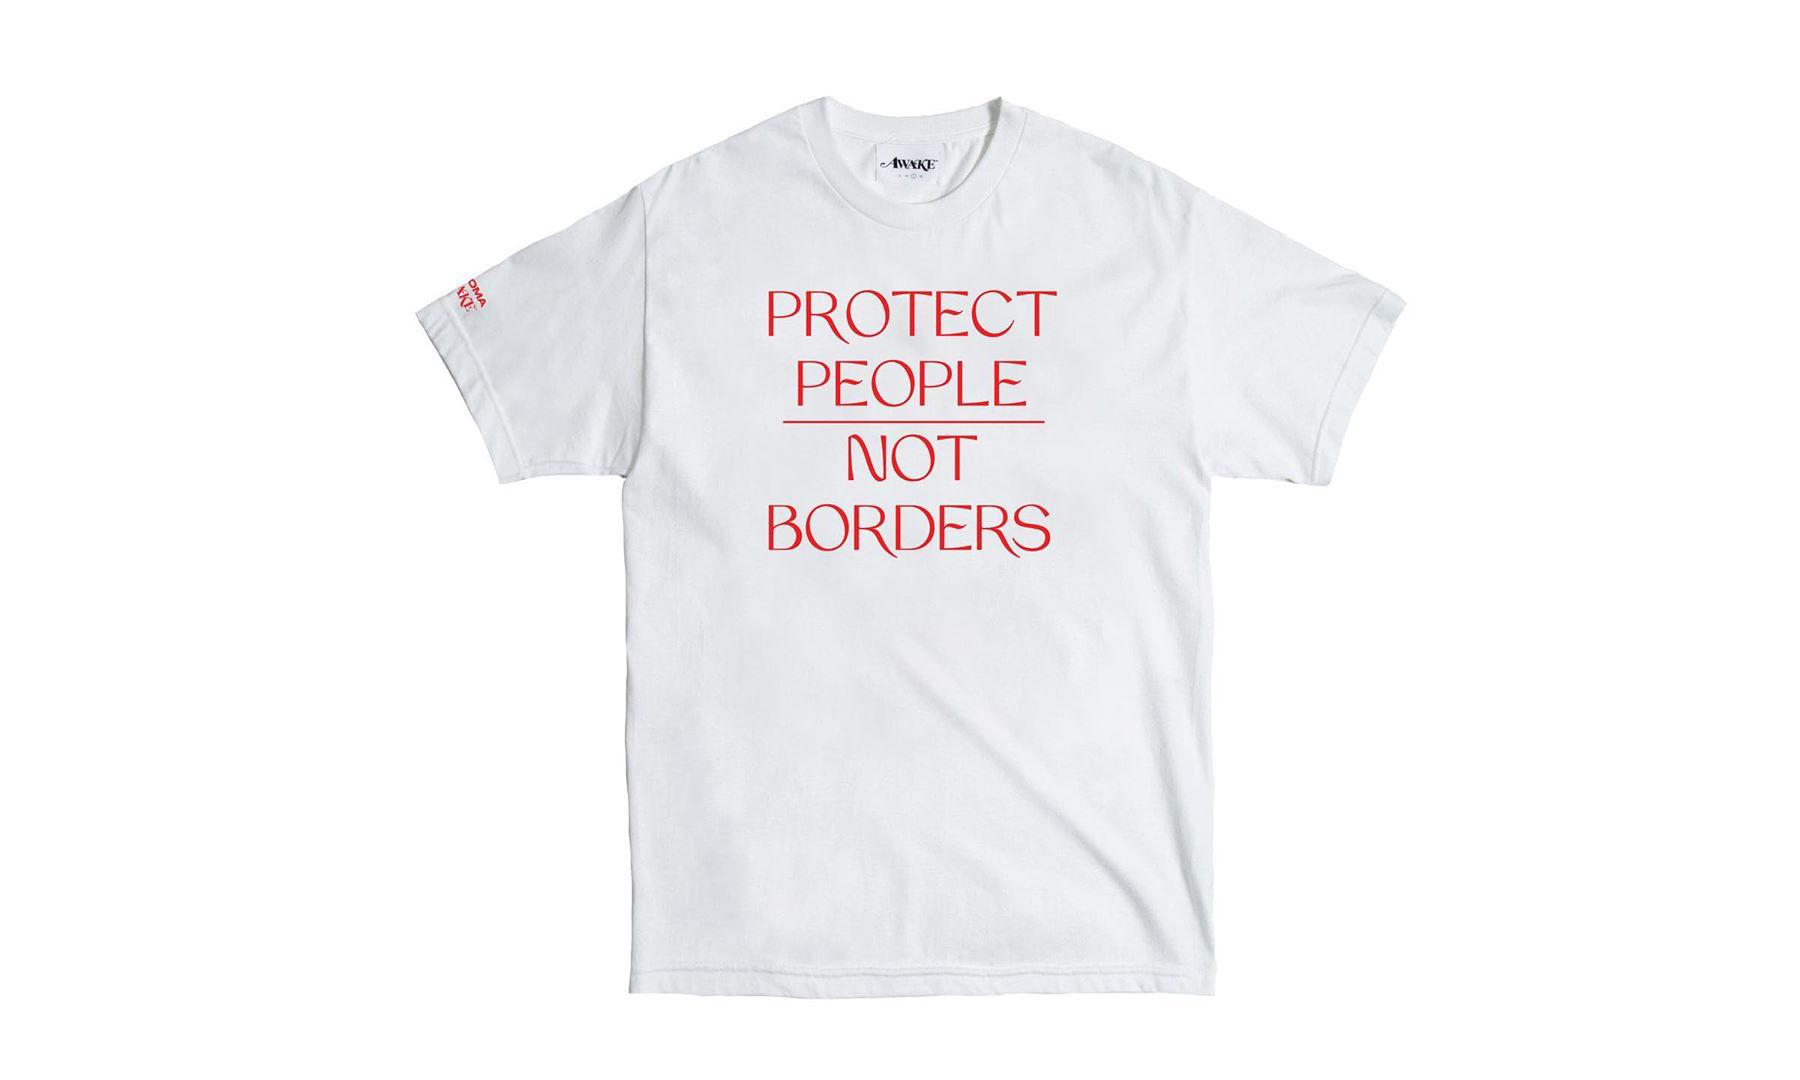 AWAKE NY 打造慈善 T-Shirt 帮助美墨边境移民